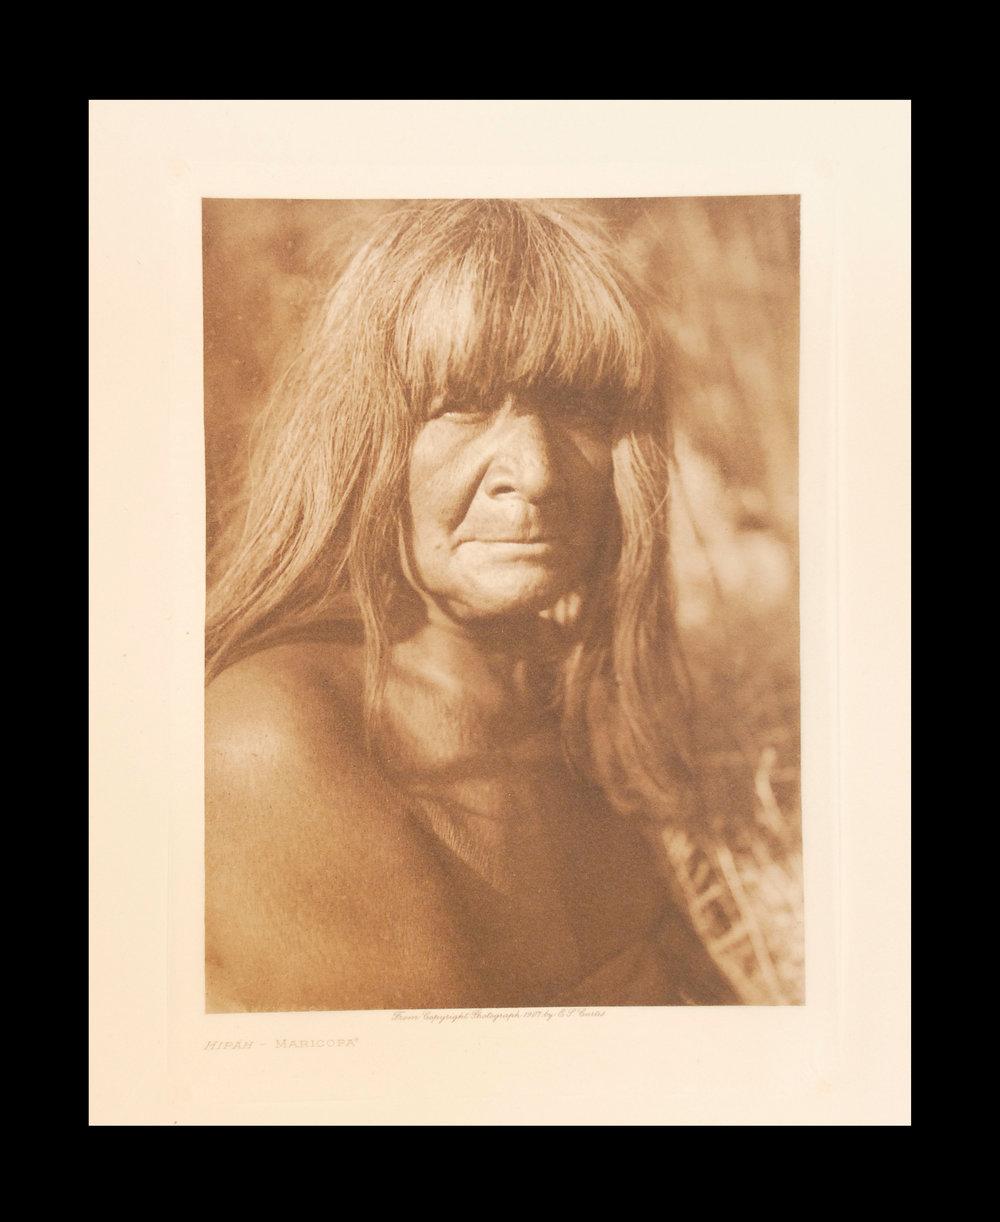 """Hipah - Maricopa"" 1907 Vol.2 Tissue Print  Vintage Photogravure"